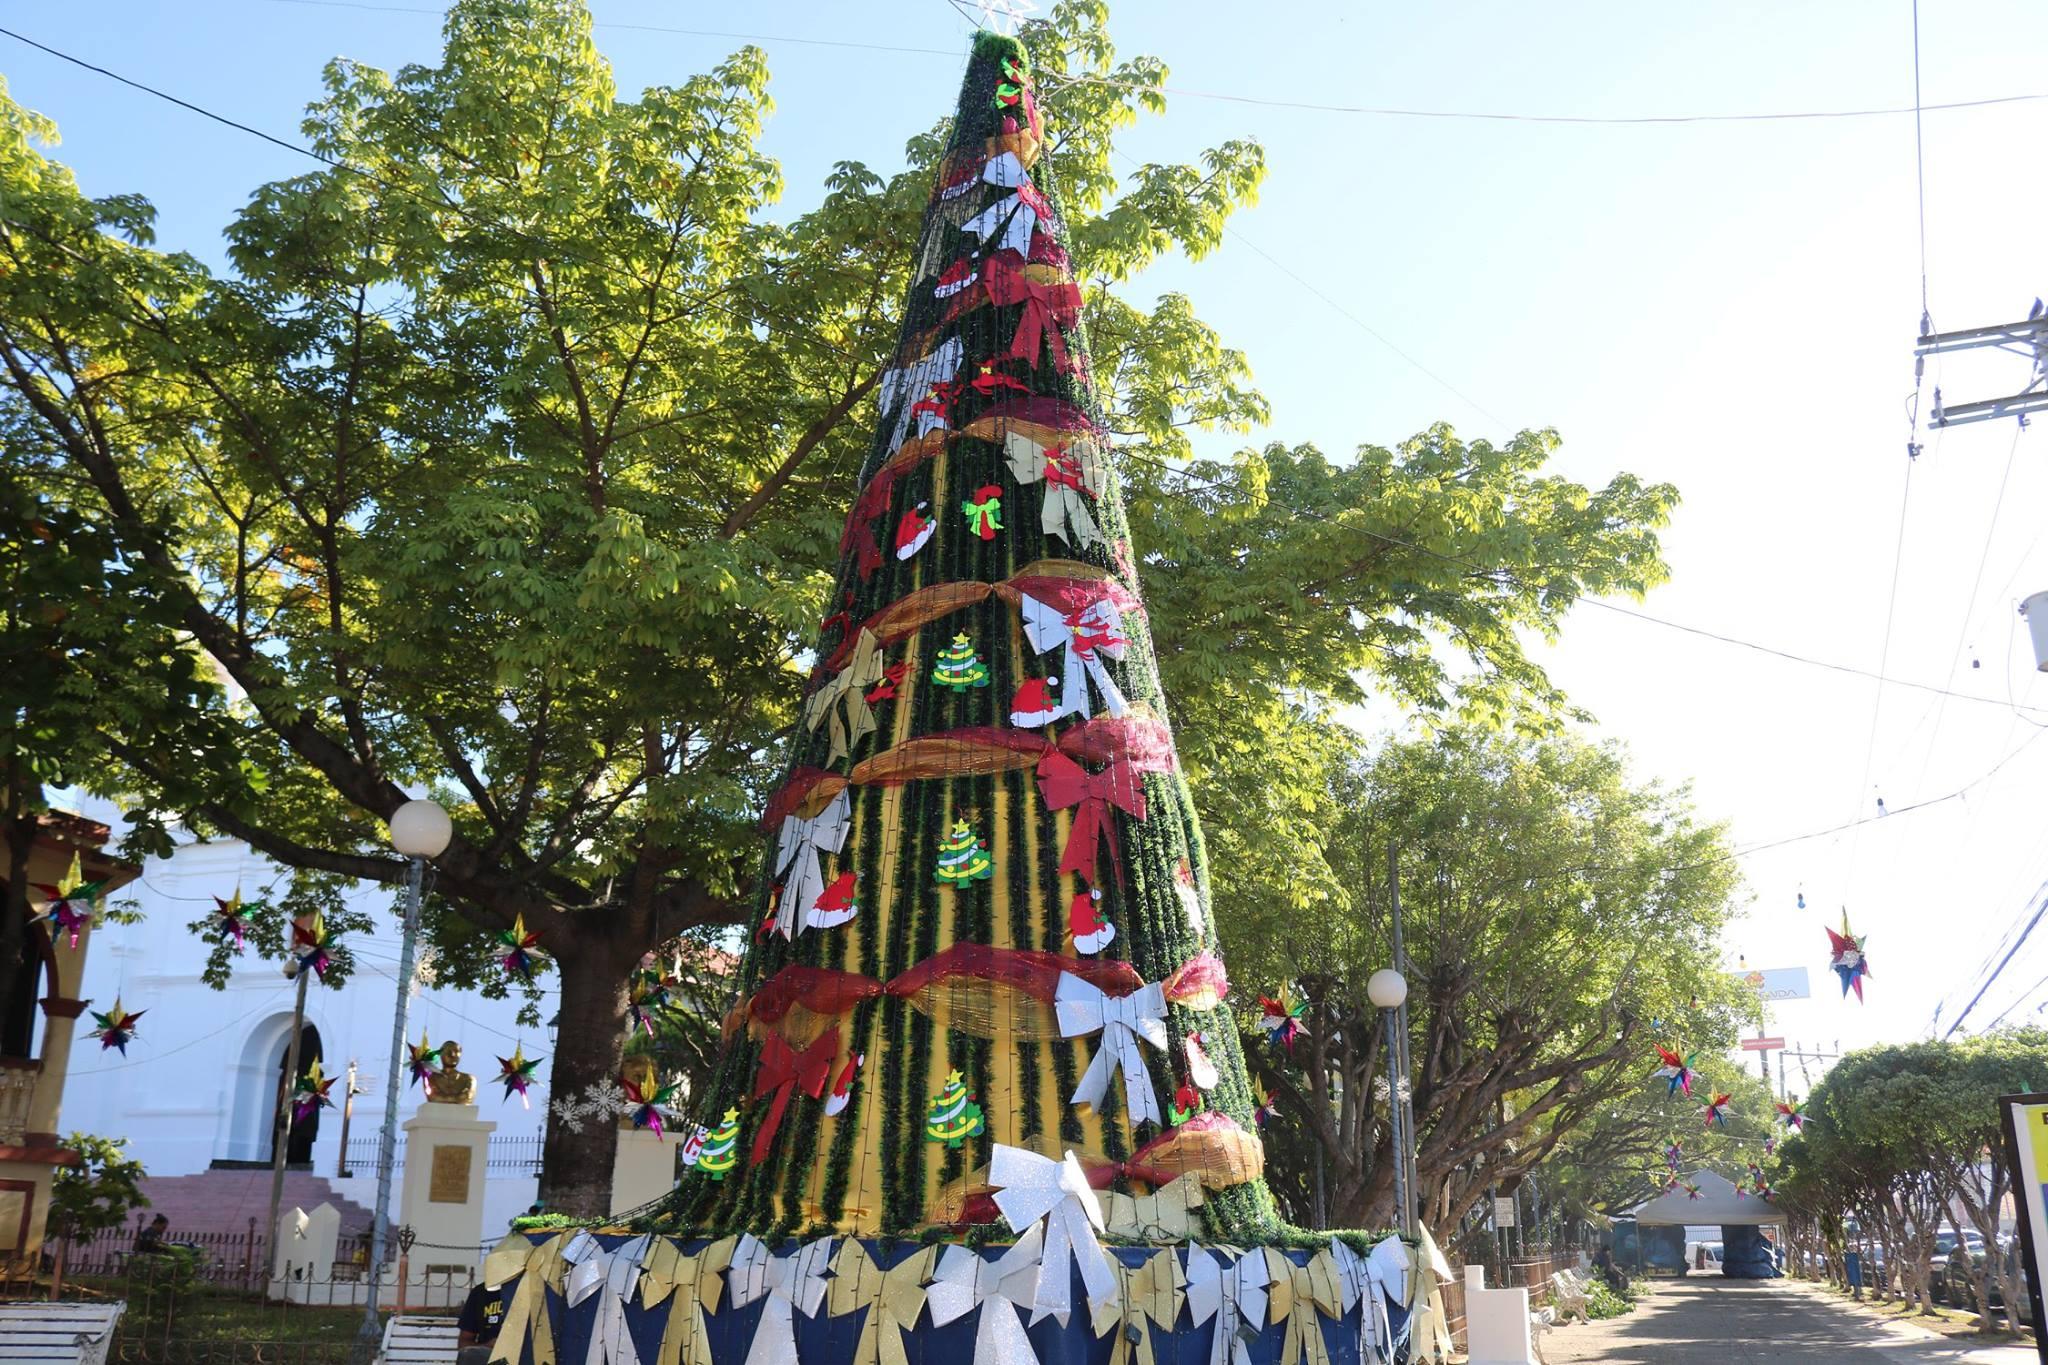 Decoracion navideña, parque Raúl F. Munguía